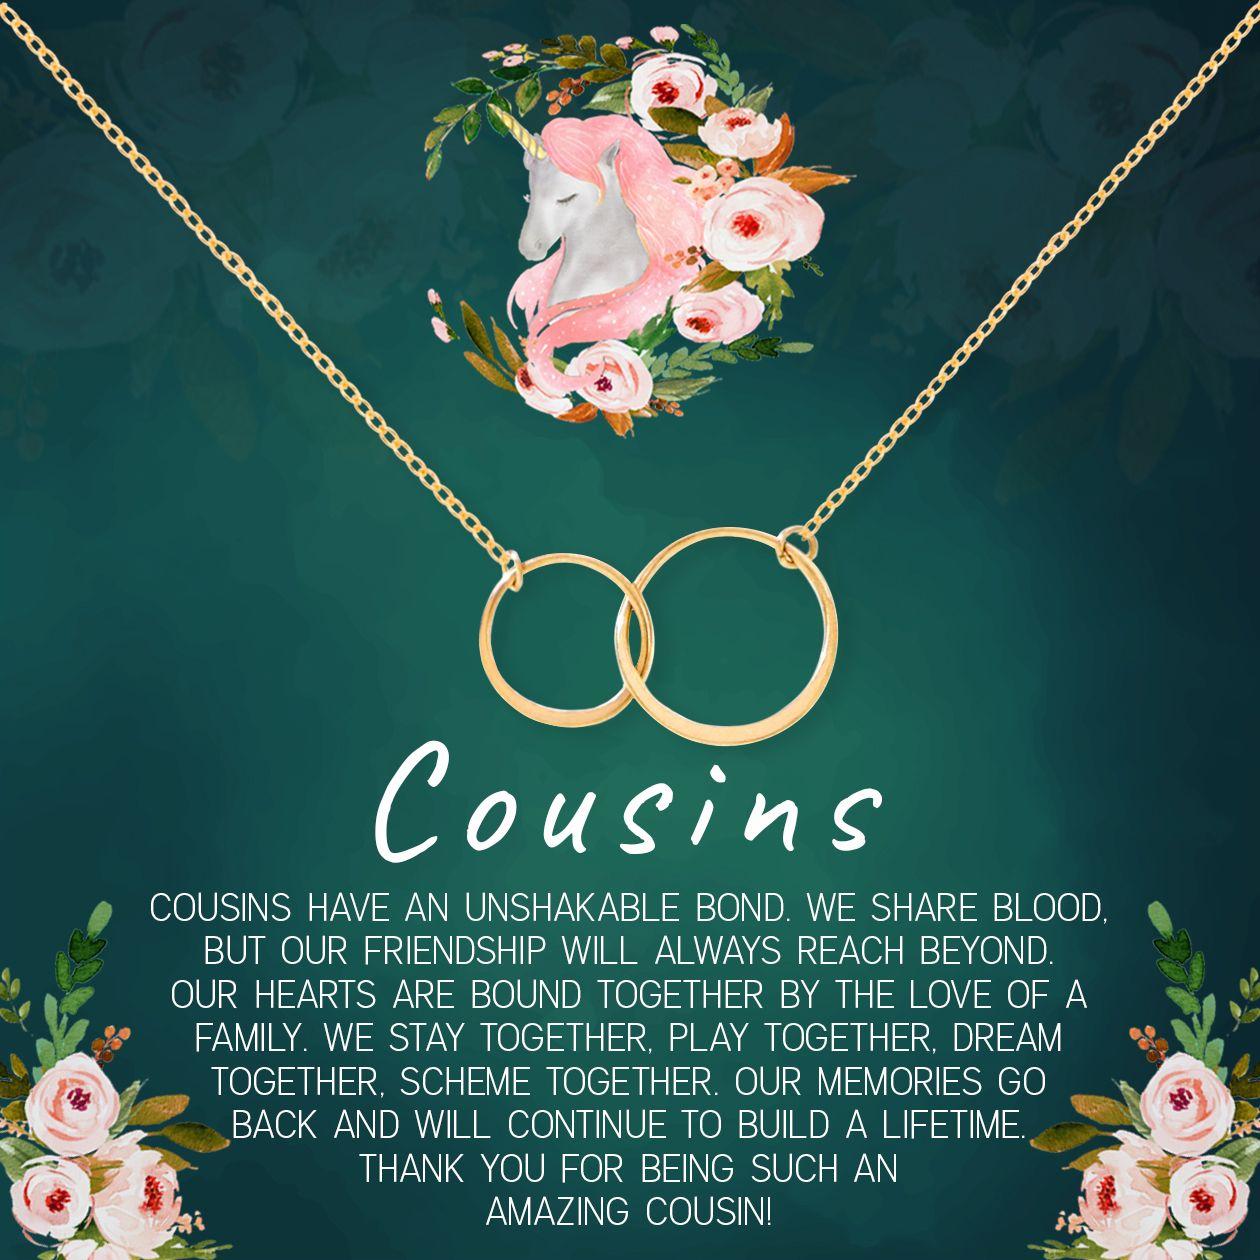 Cousins Double Circles Necklace In 2021 Heartfelt Gifts Double Circle Necklace Best Friend Necklaces